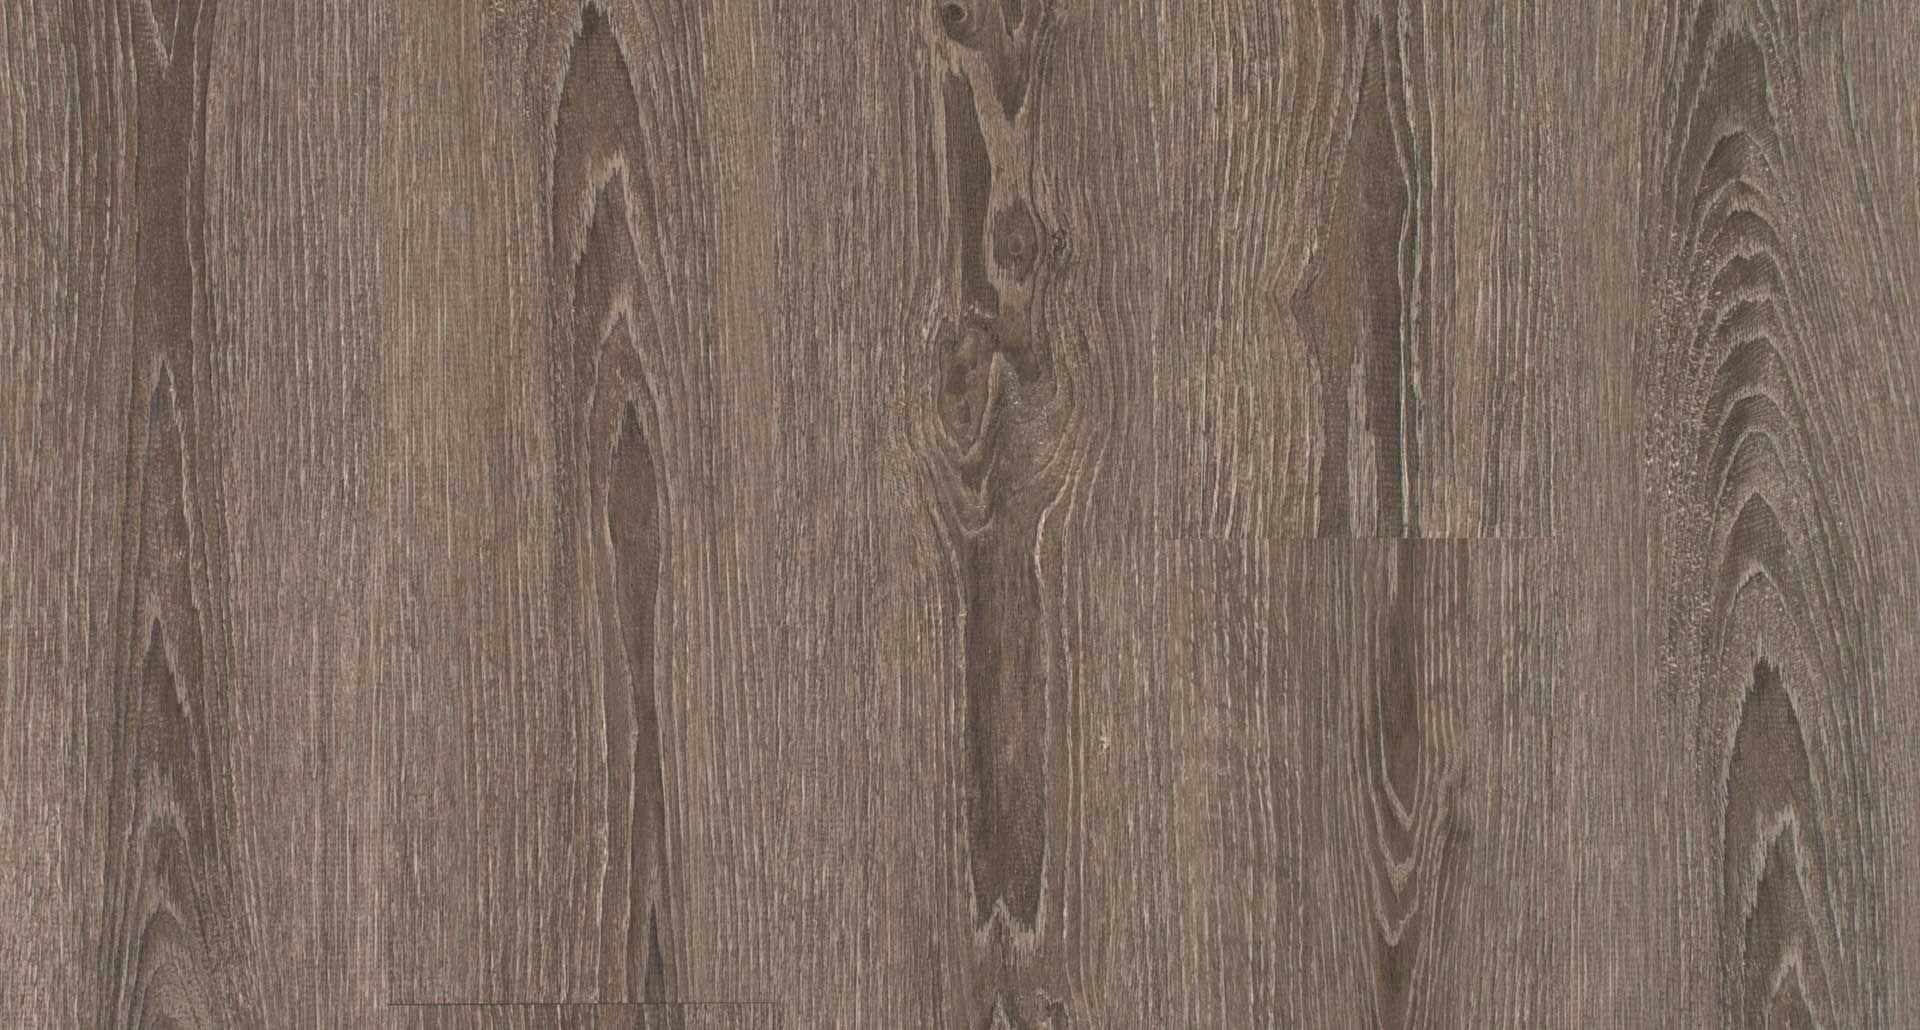 Cashmere Oak Smooth Laminate Floor Light Caramel Color Finish 10mm 1 Strip Plank Flooring Easy To Install Pergo Lifetime Warranty